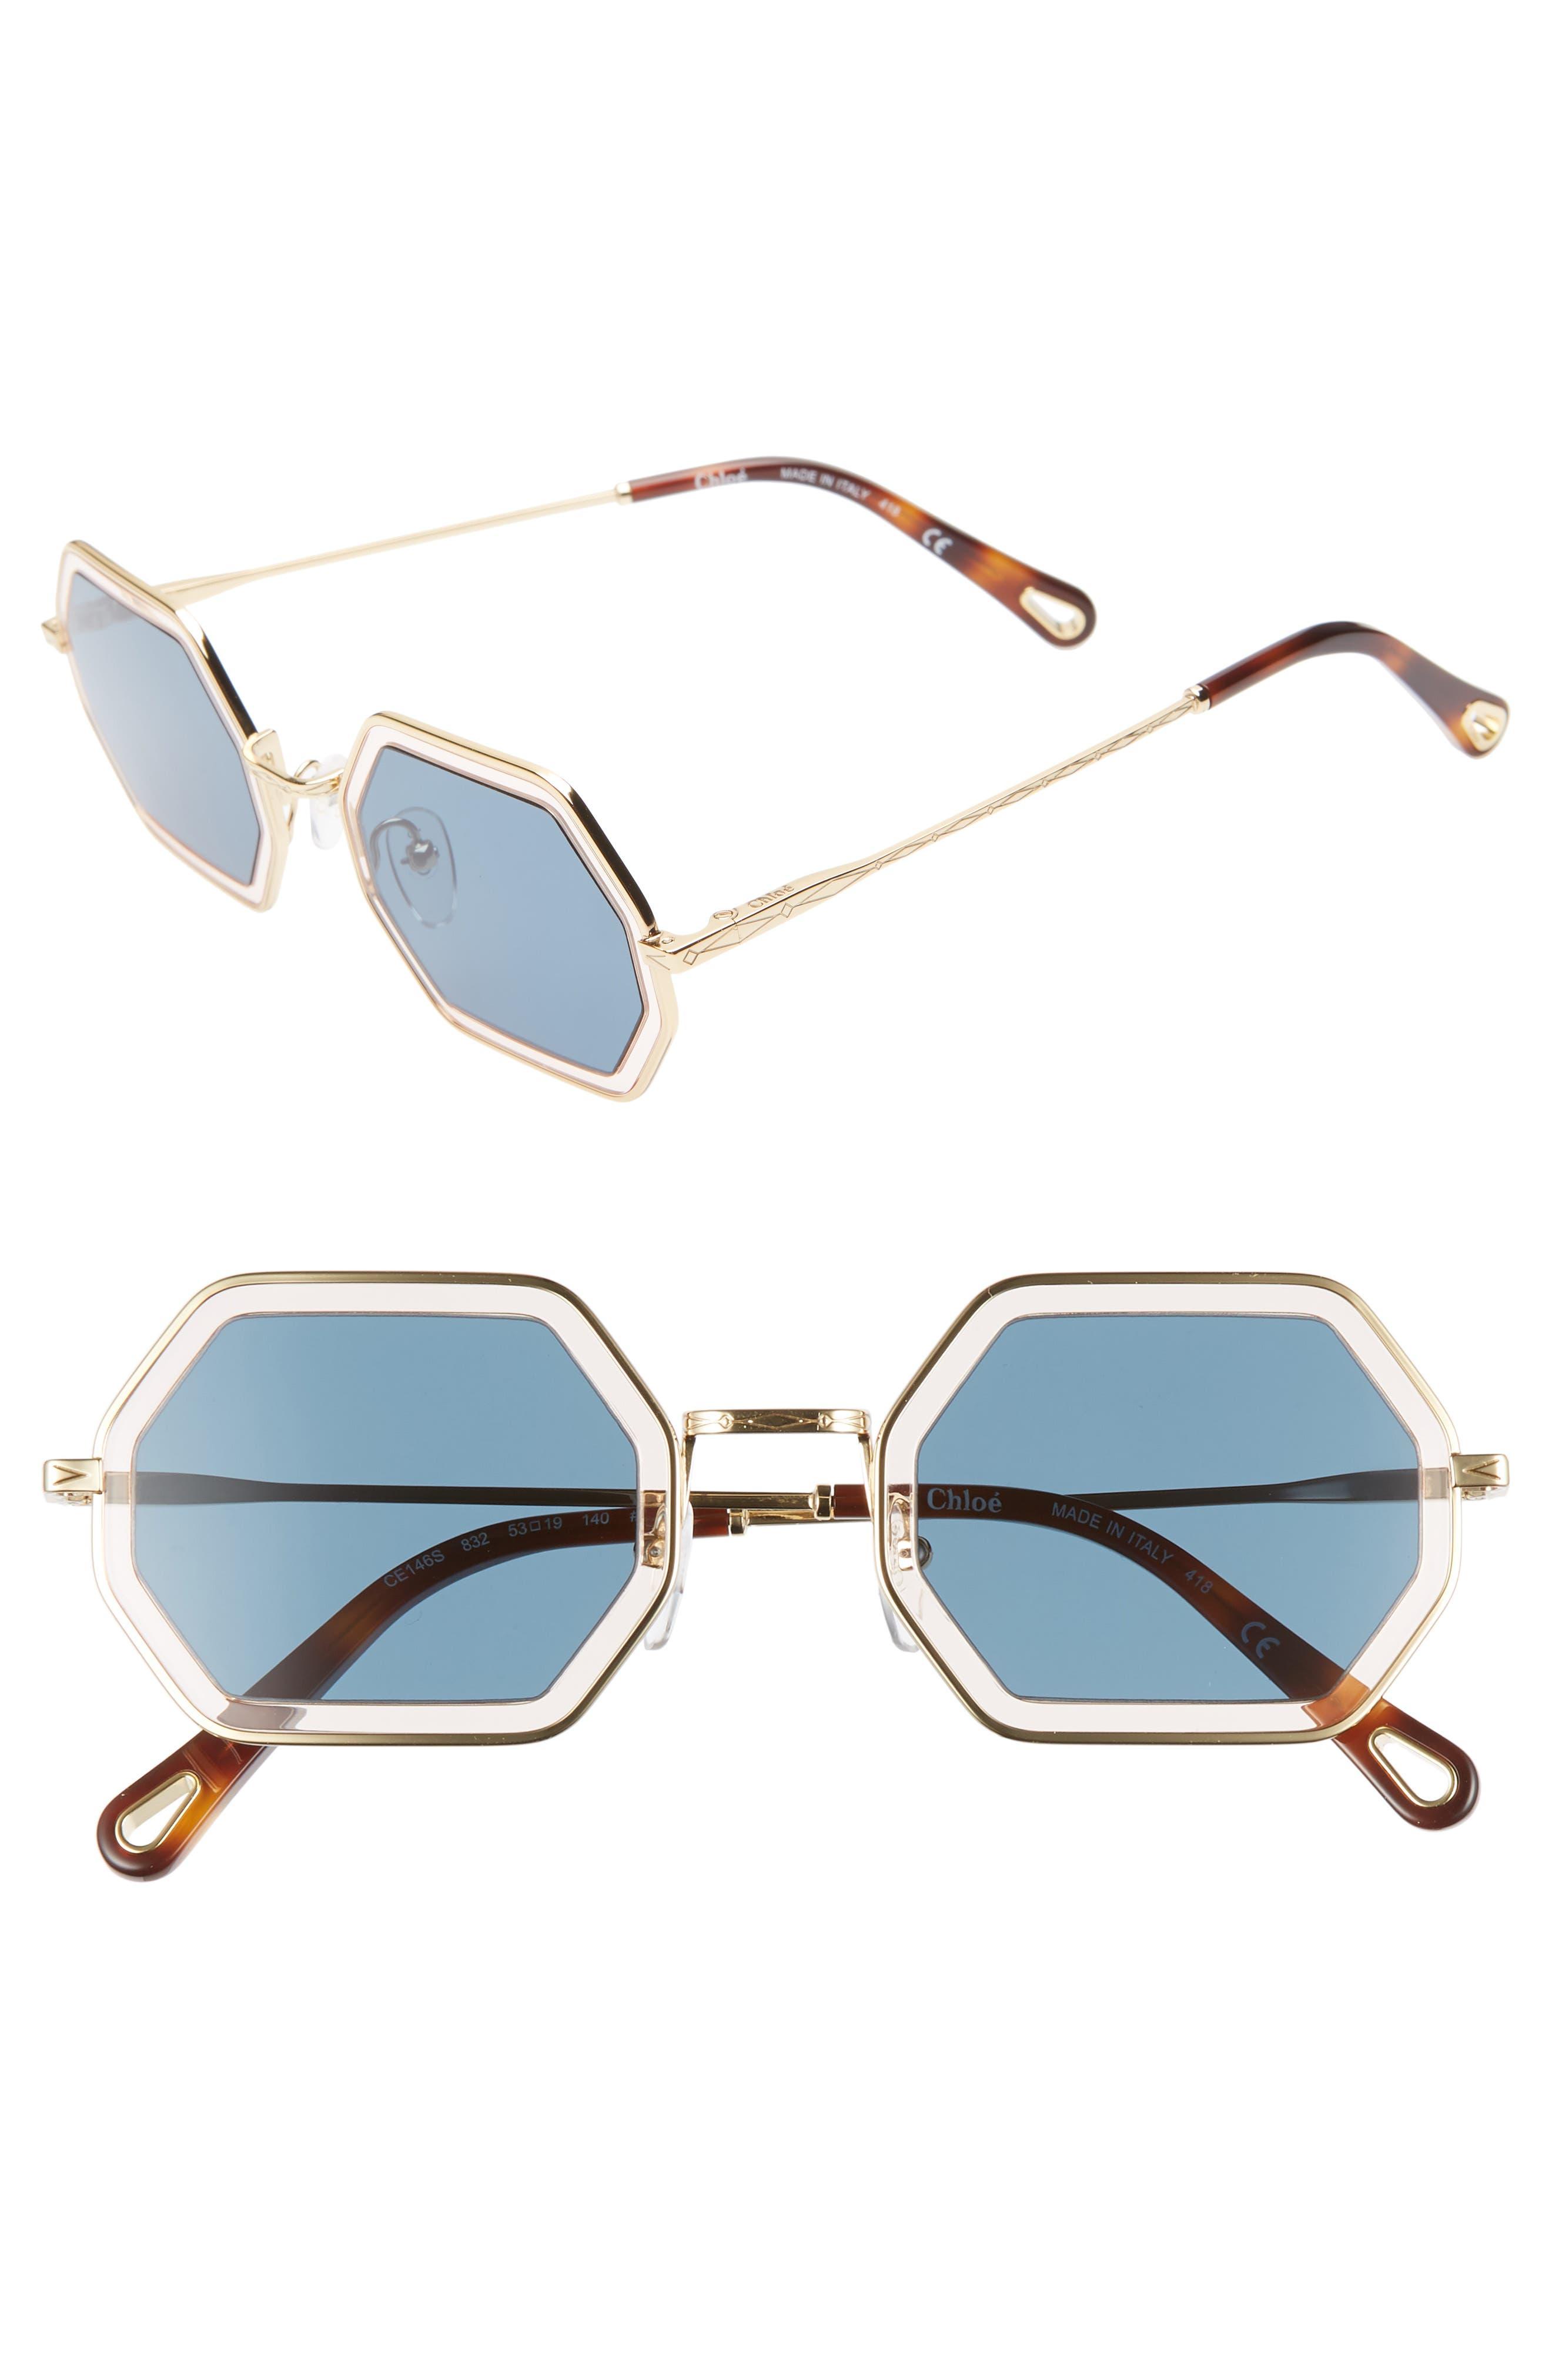 Chloe Tally 5m Octagon Sunglasses - Gold/ Light Pink/ Blue